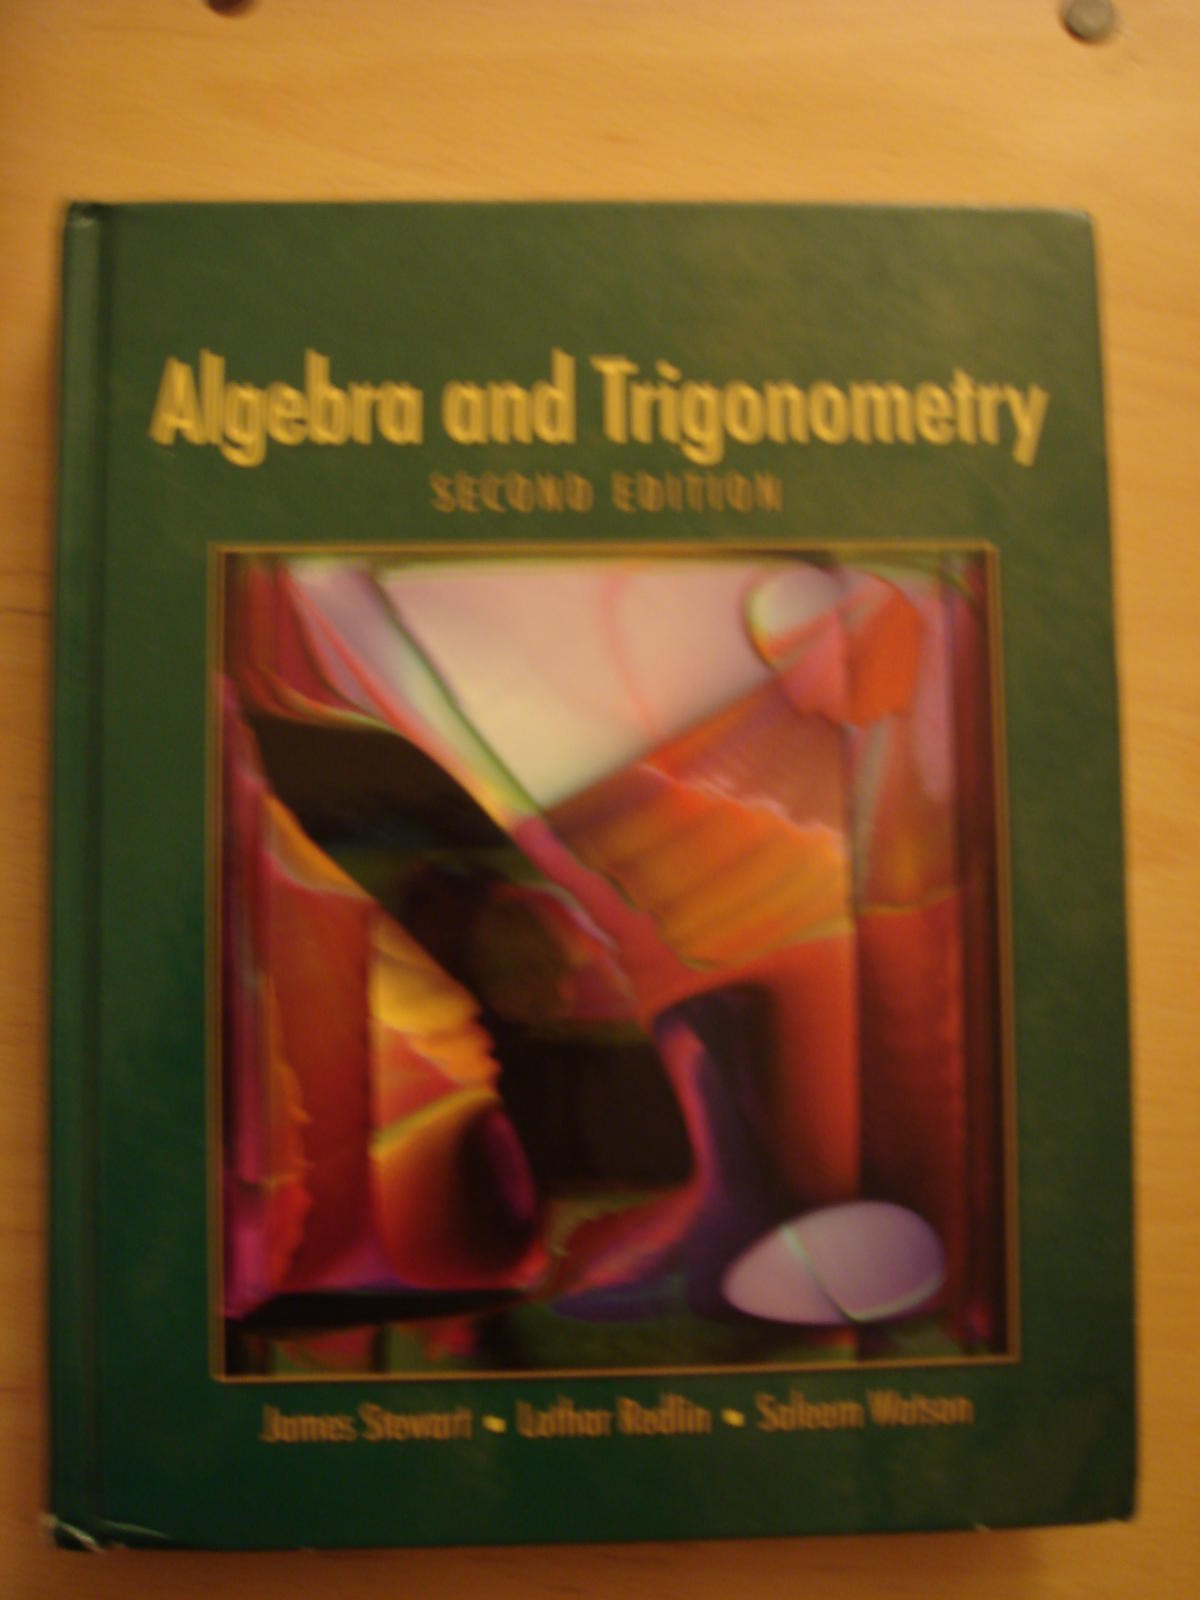 Algeb Nn Foster Free Hlp With Algebra